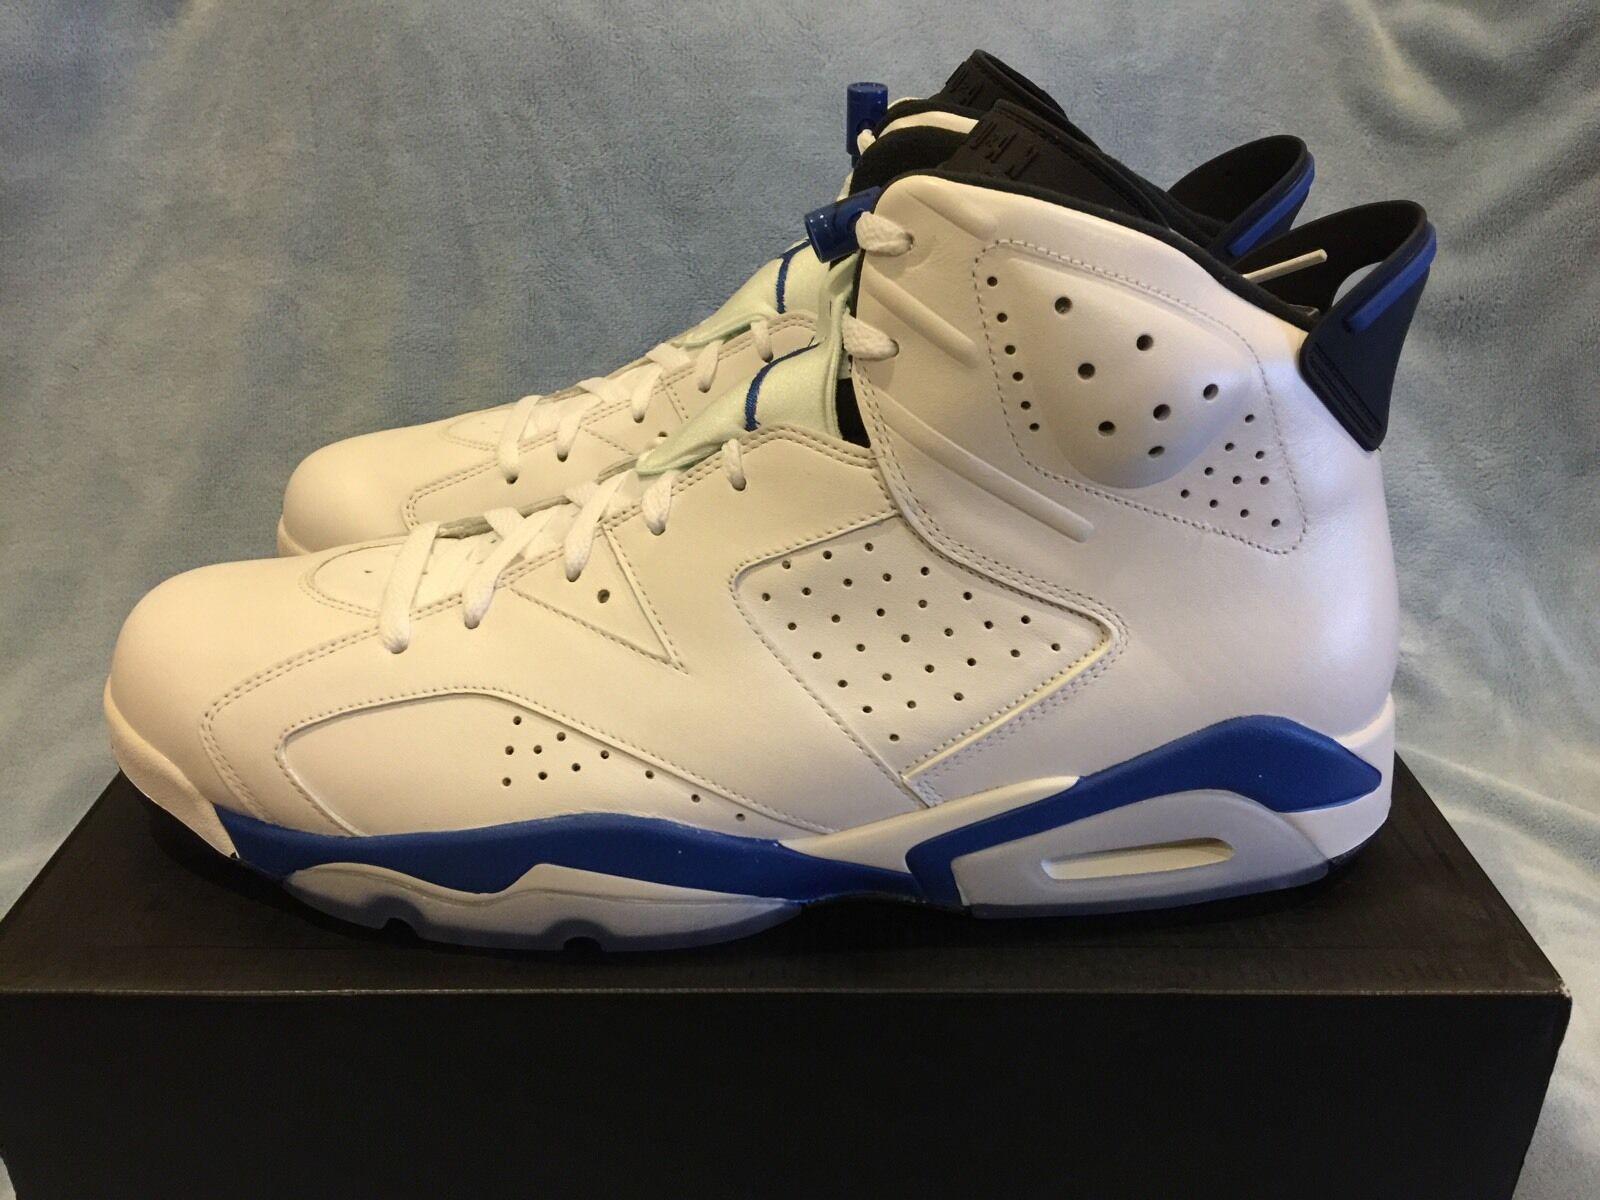 Men's Nike Air Jordan 6 VI Retro 384664-107 Size 17